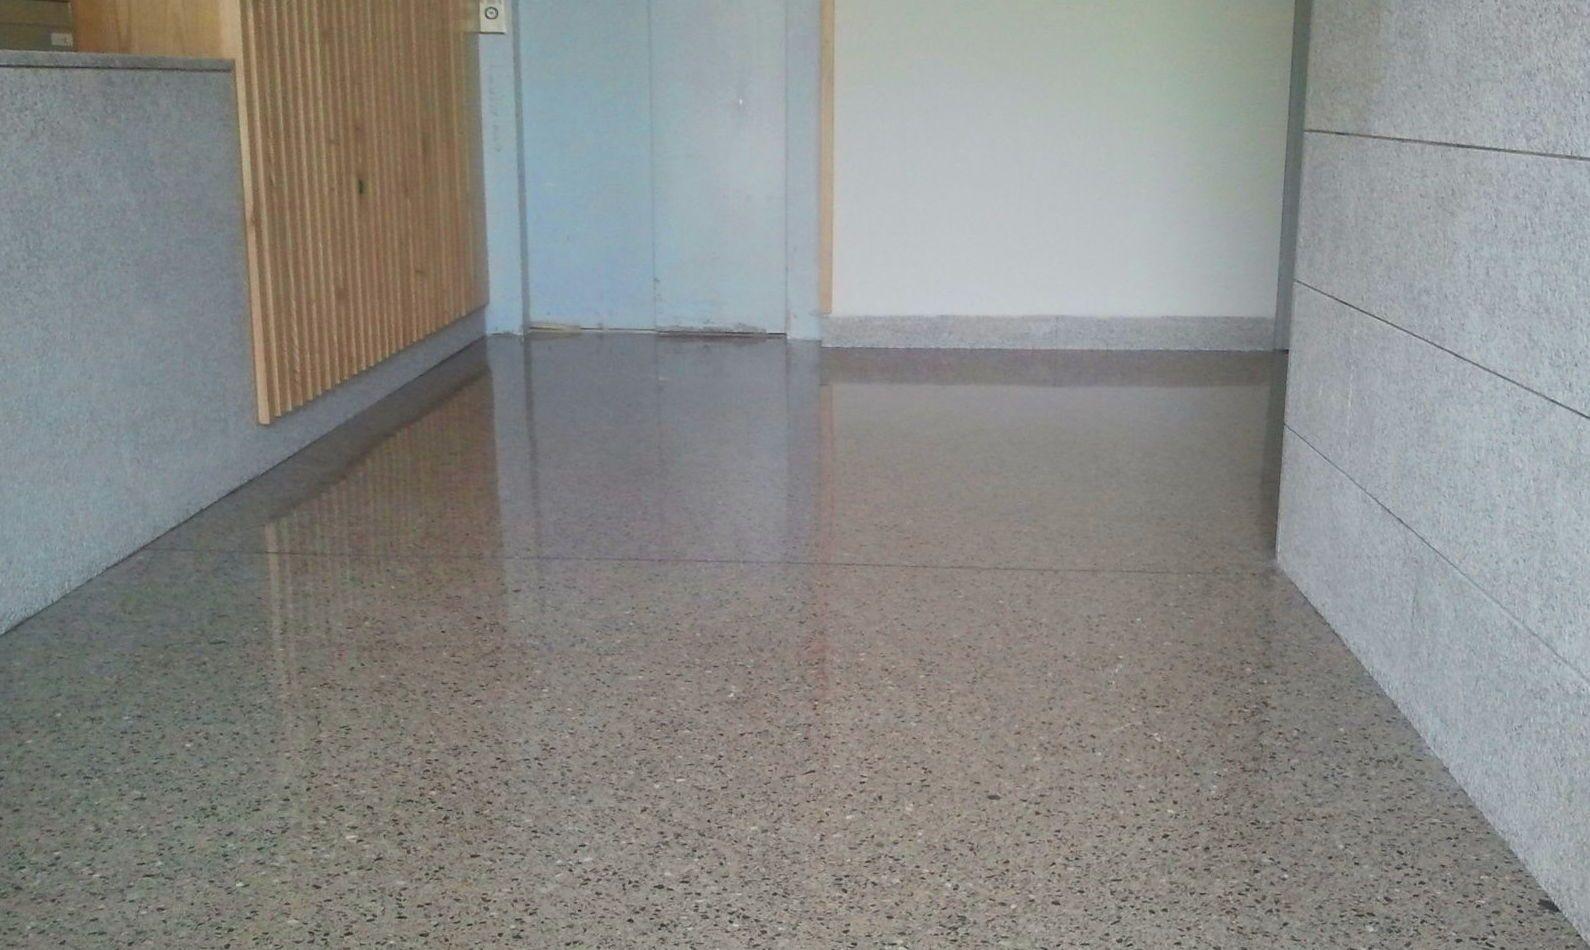 Suelos hormigon pulido cool pavimento de hormign encerado - Pavimento hormigon pulido ...